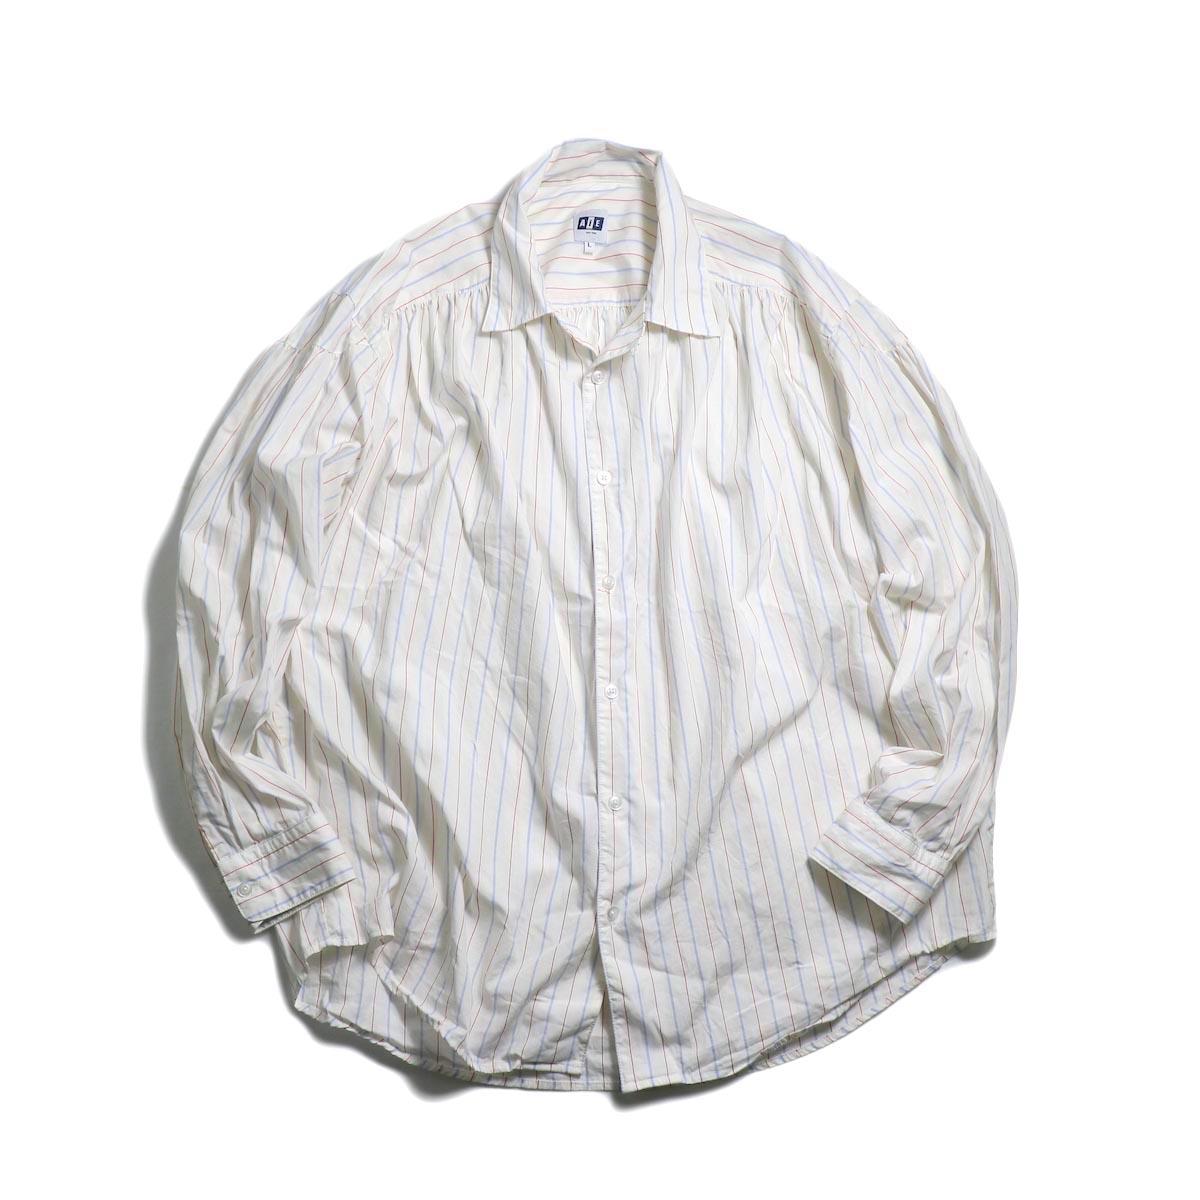 AiE / Painter Shirt -Regent St. (Red/Blu/Wht)